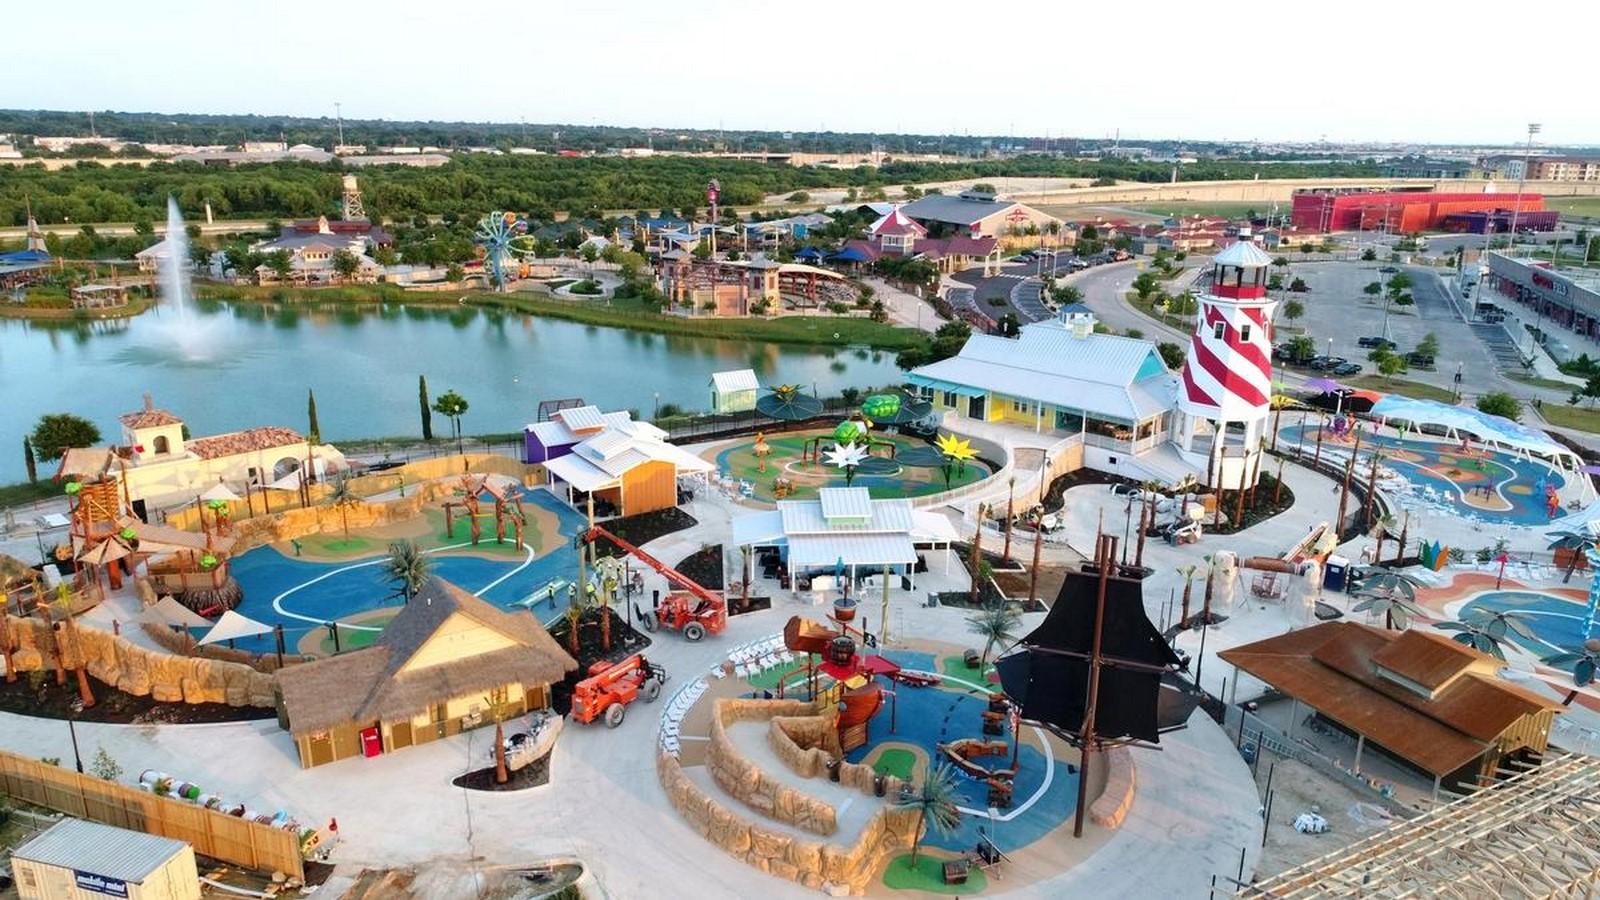 Designing amusement Park for Disabled - Sheet2